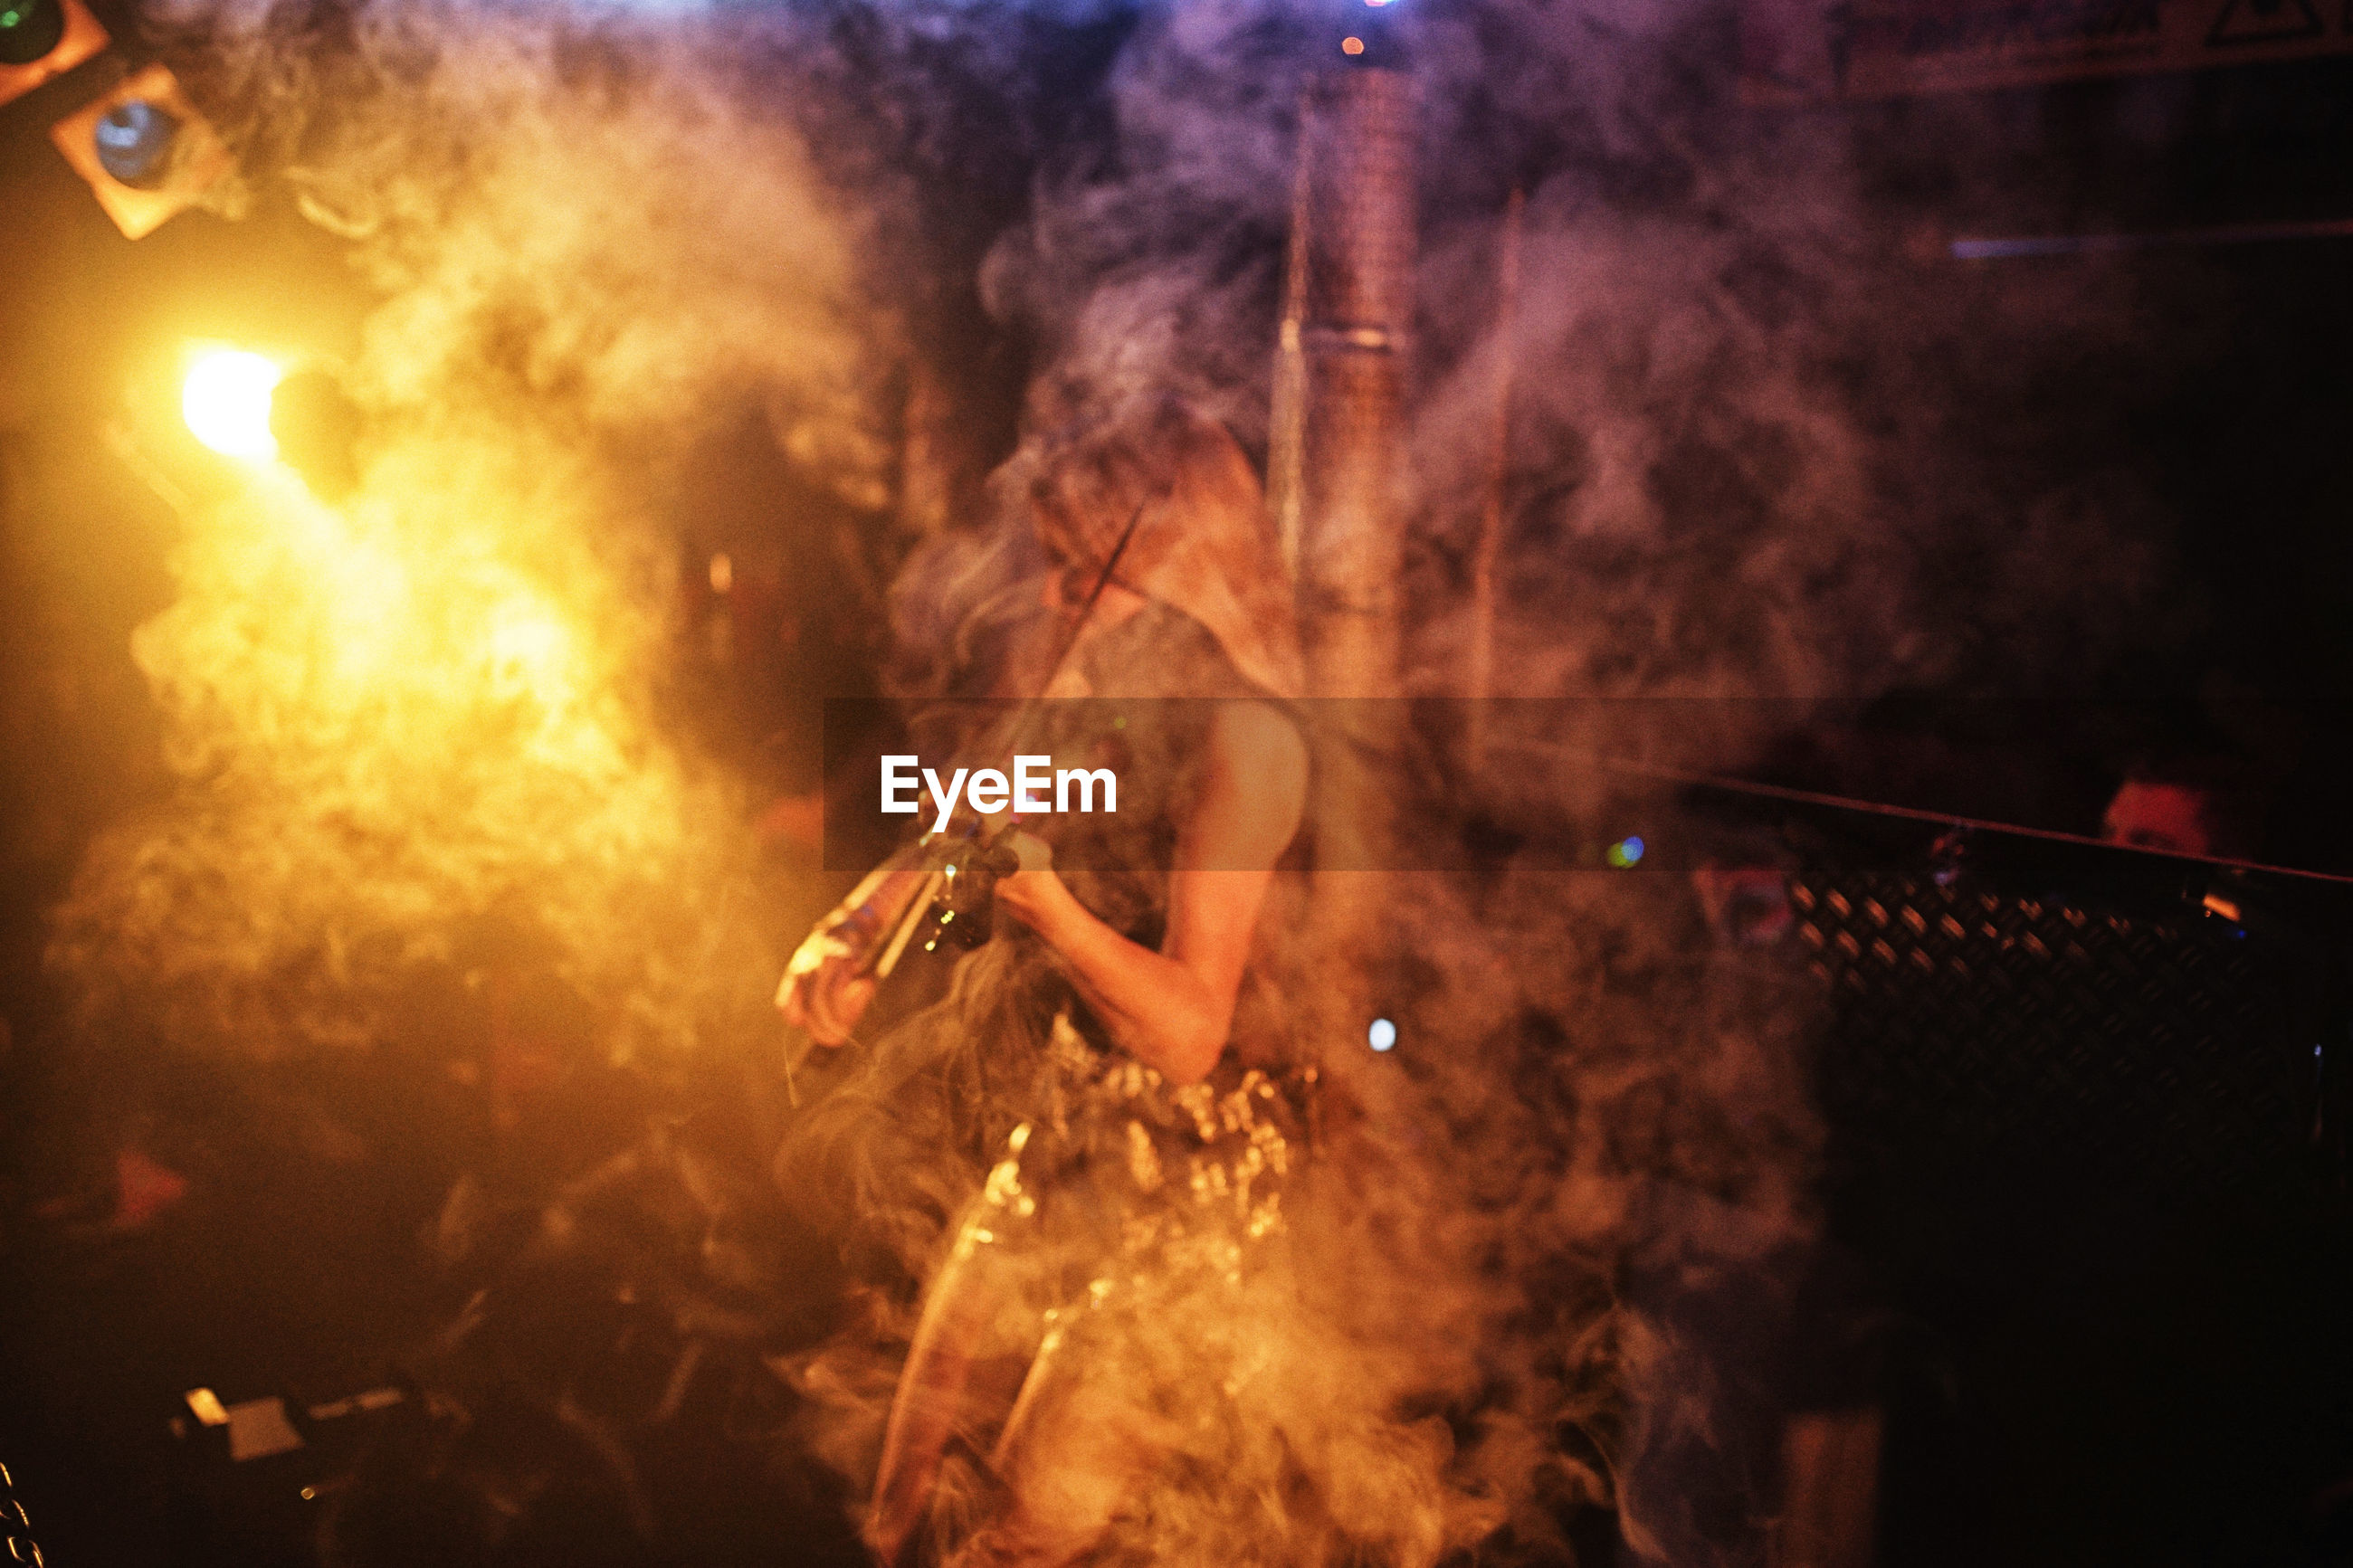 LOW ANGLE VIEW OF MAN HOLDING ILLUMINATED LIGHTING EQUIPMENT